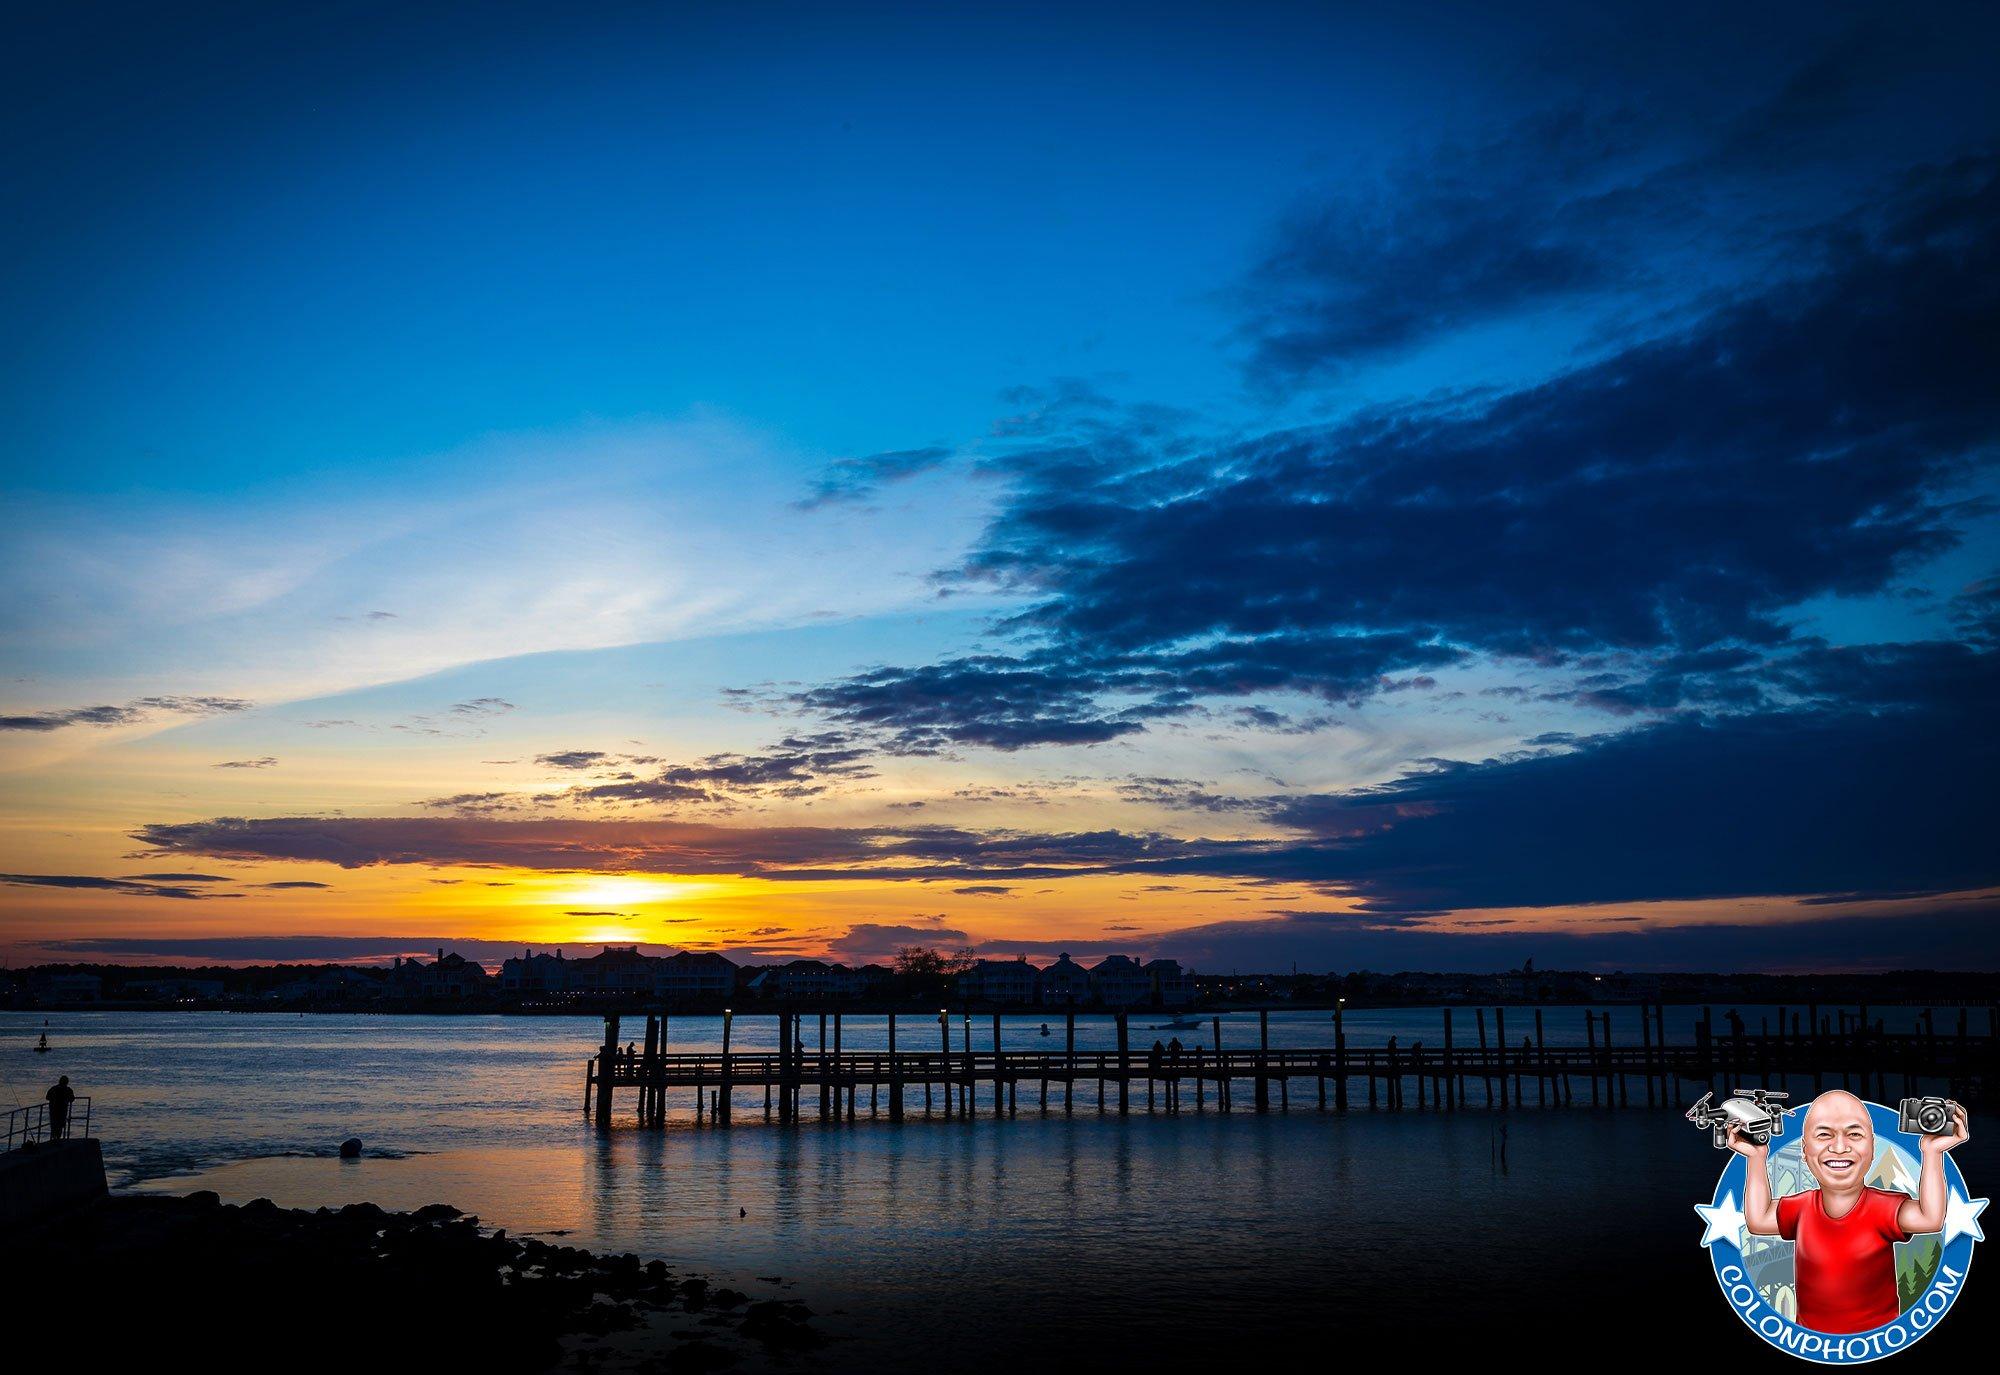 OCEAN-CITY-MARYLAND---EPIC-BEAUTIFUL-SUNSET-PHOTO-BLUE-HOUR---colonphoto.com